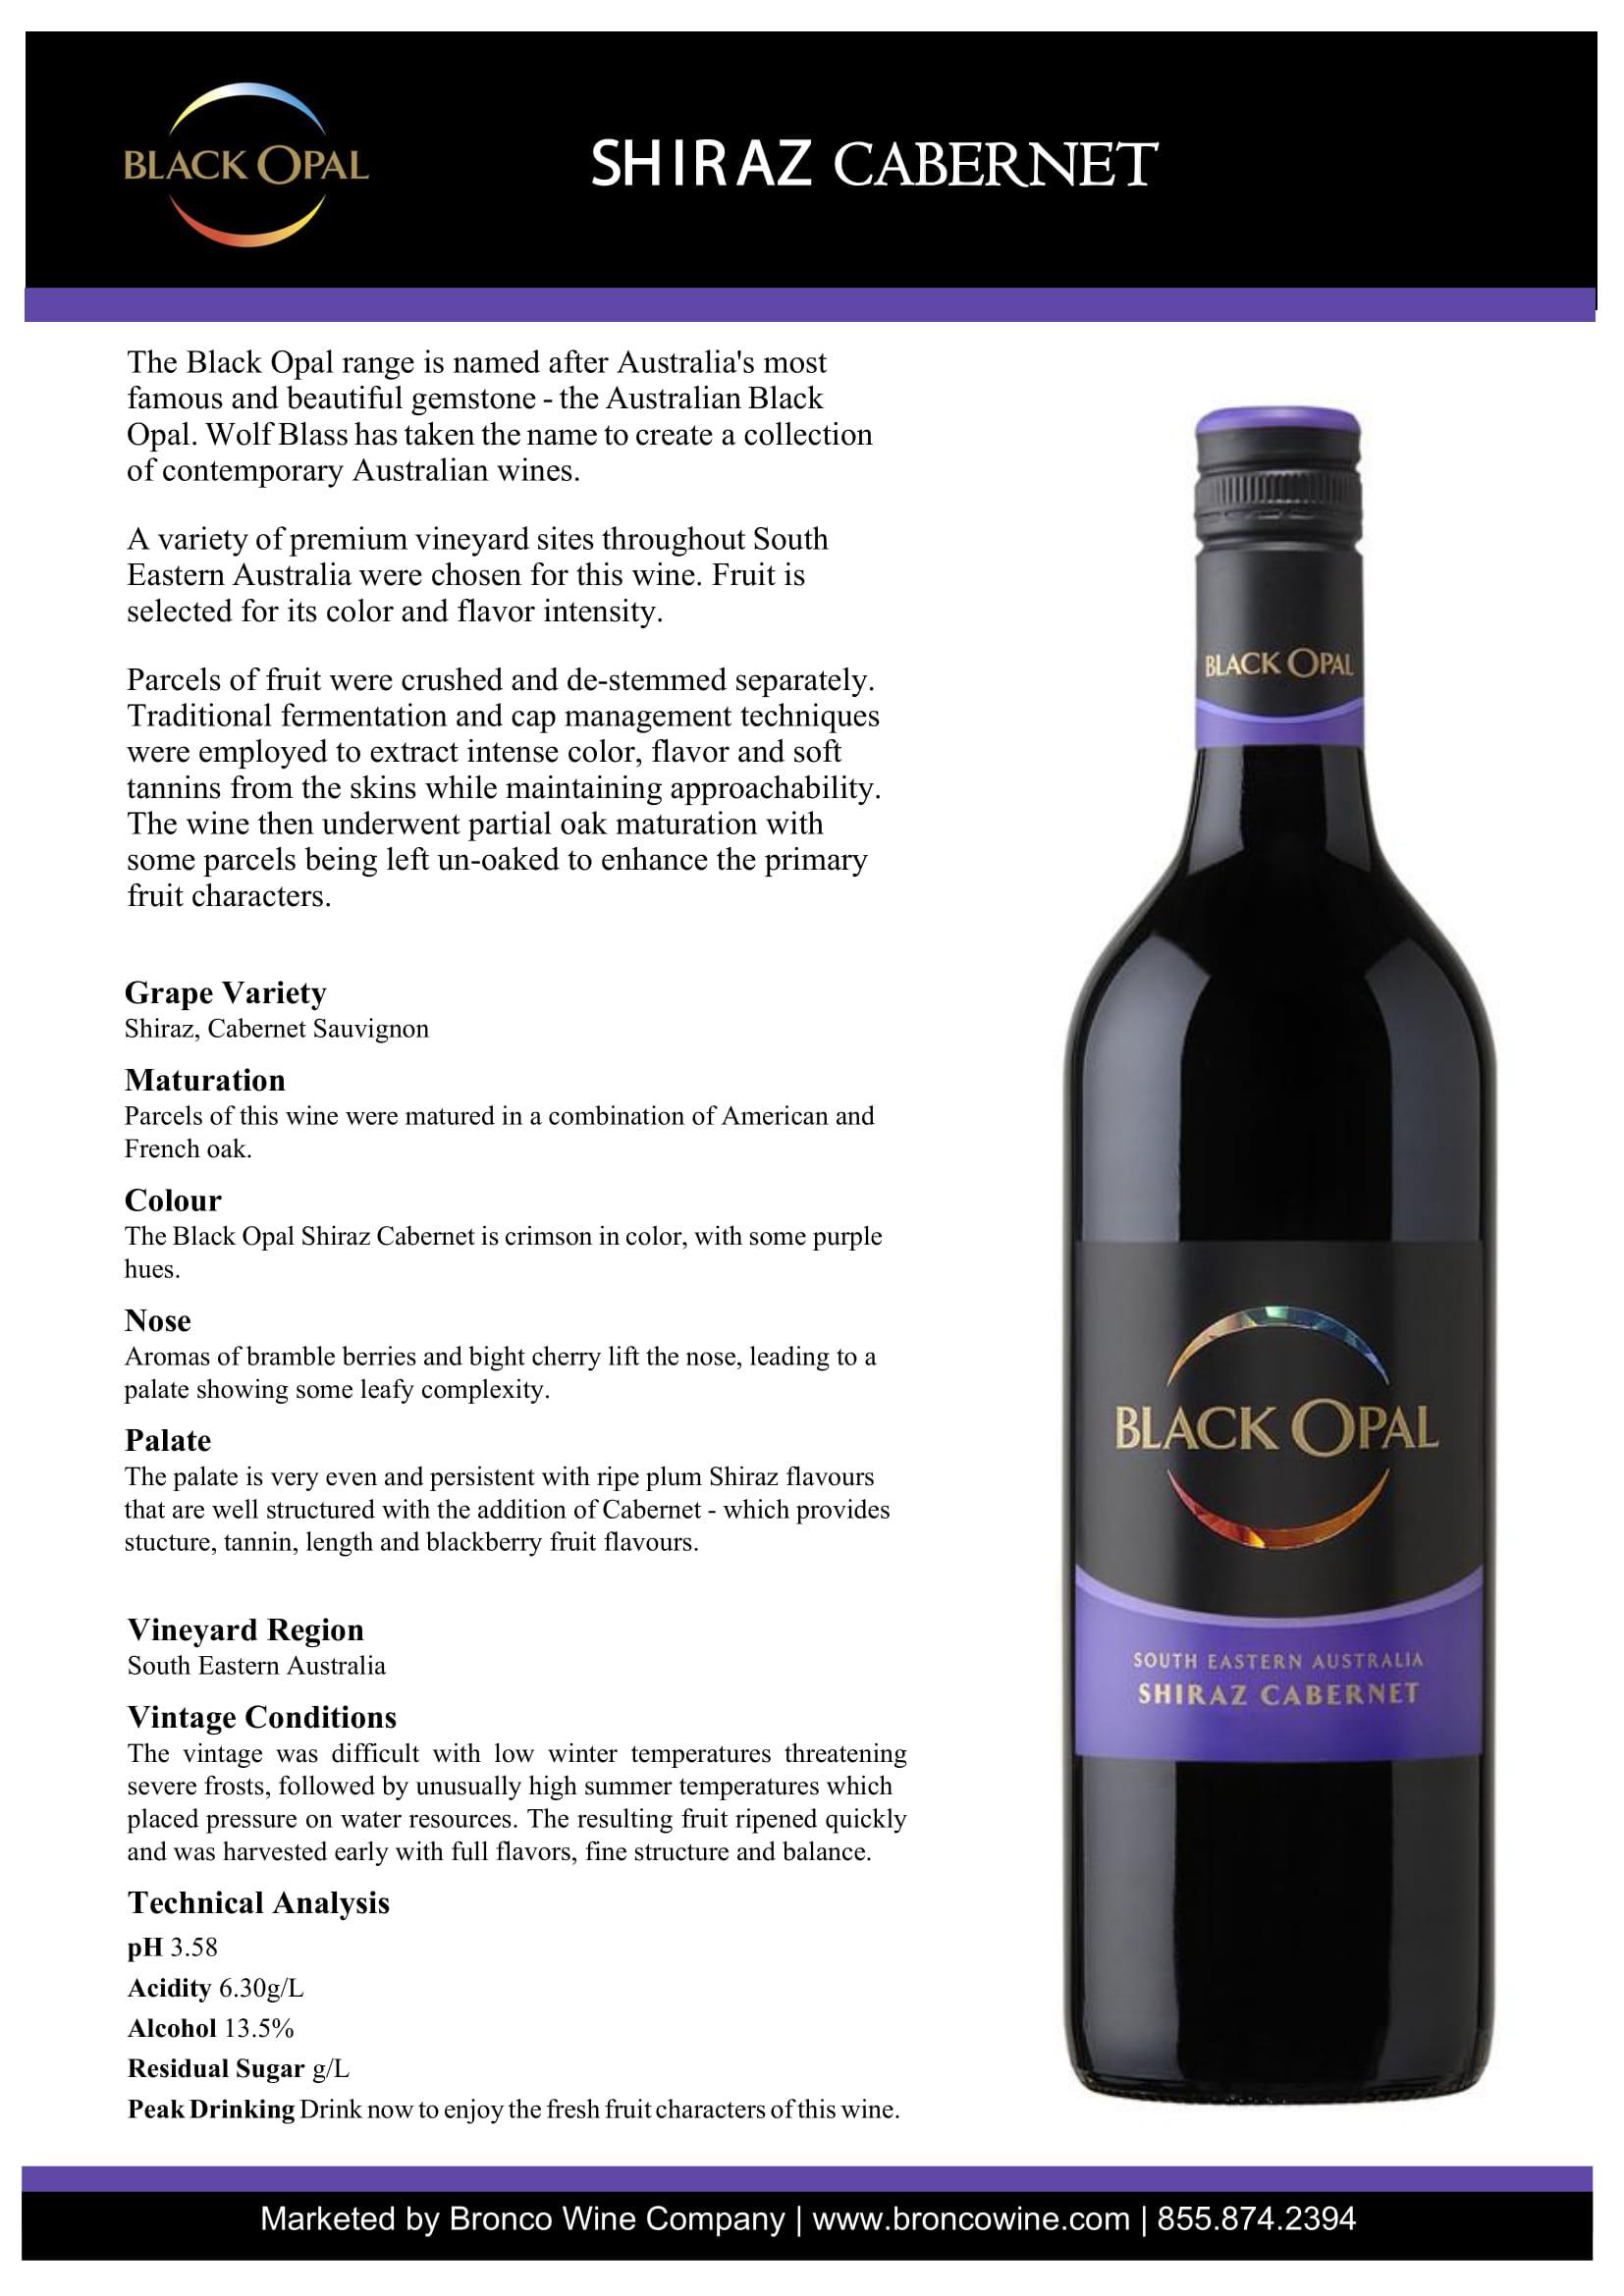 Black Opal Shiraz Cabernet Tech Sheet